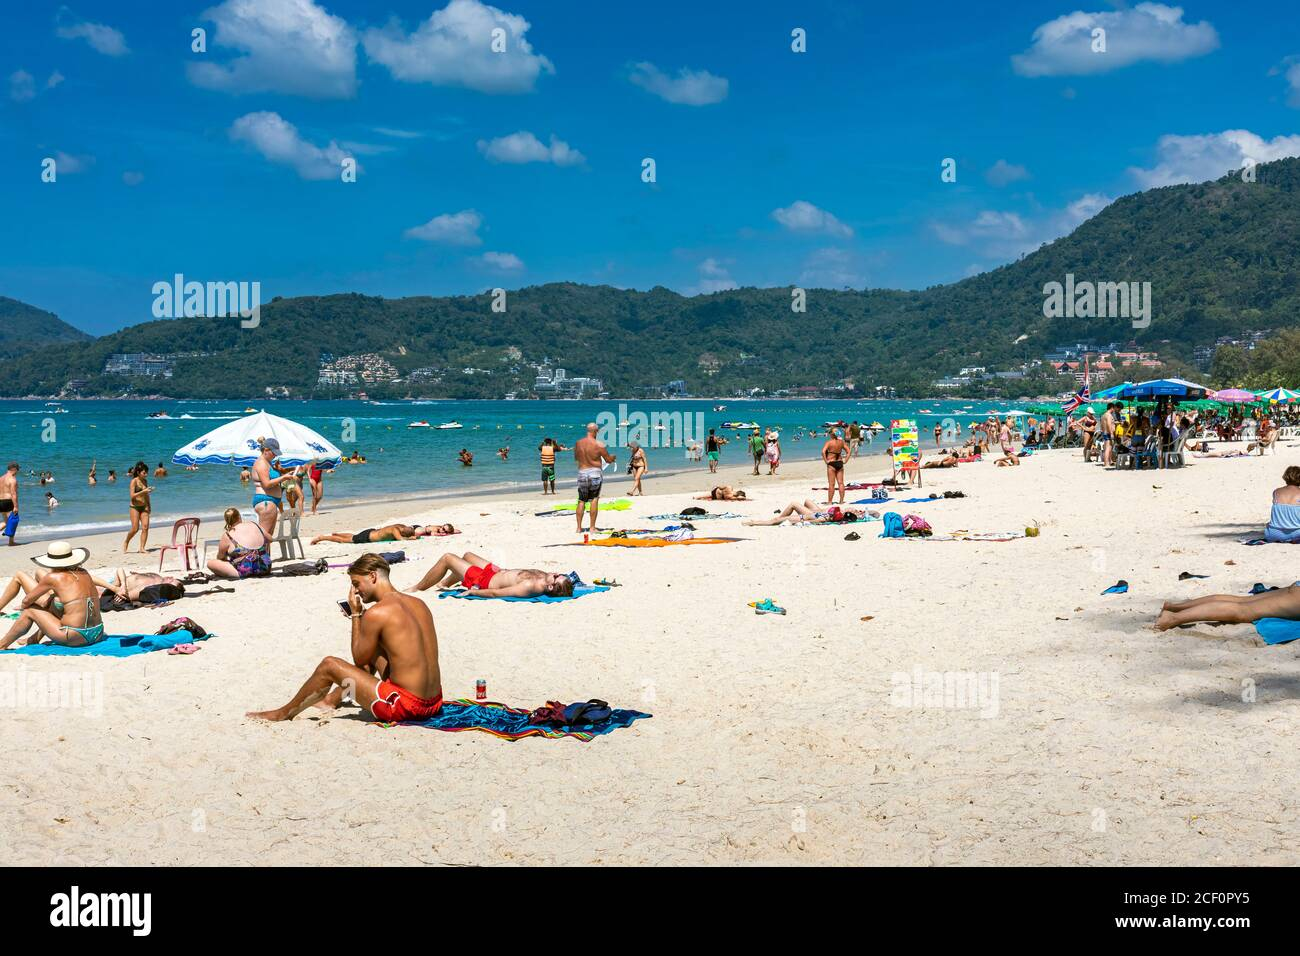 Touristen Sonnenbaden am Strand, Patong, Phuket, Thailand Stockfoto